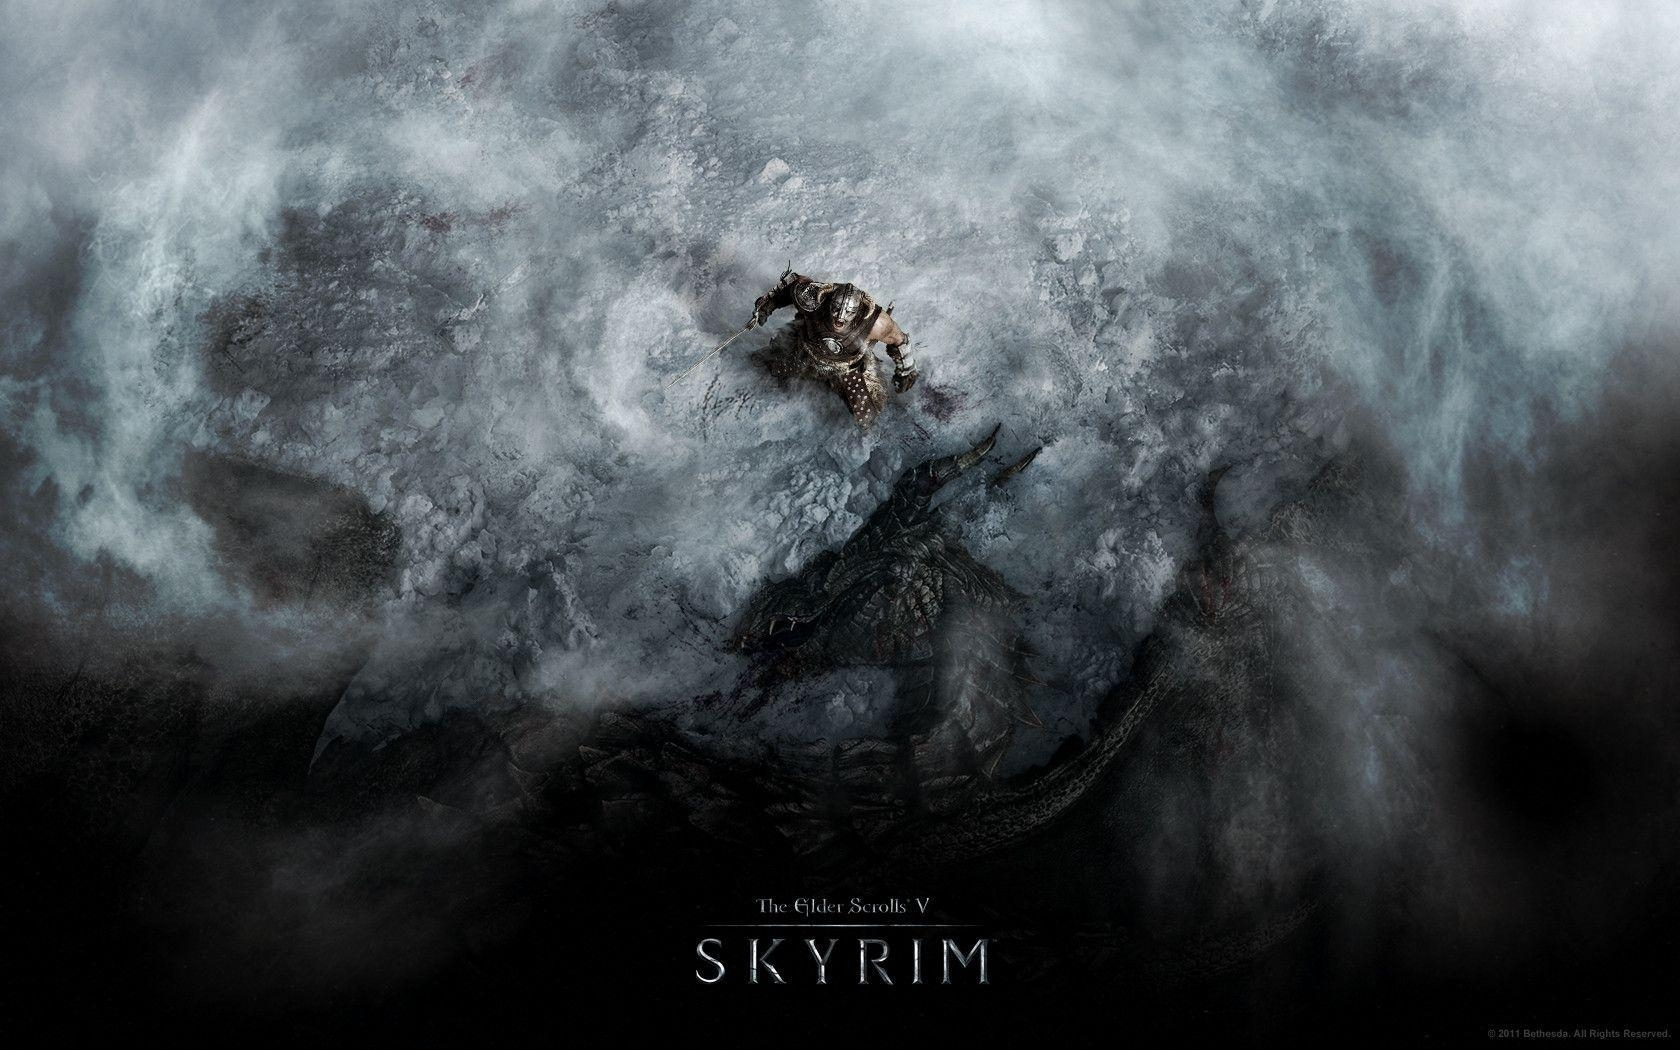 elder scrolls v skyrim wallpapers - wallpaper cave